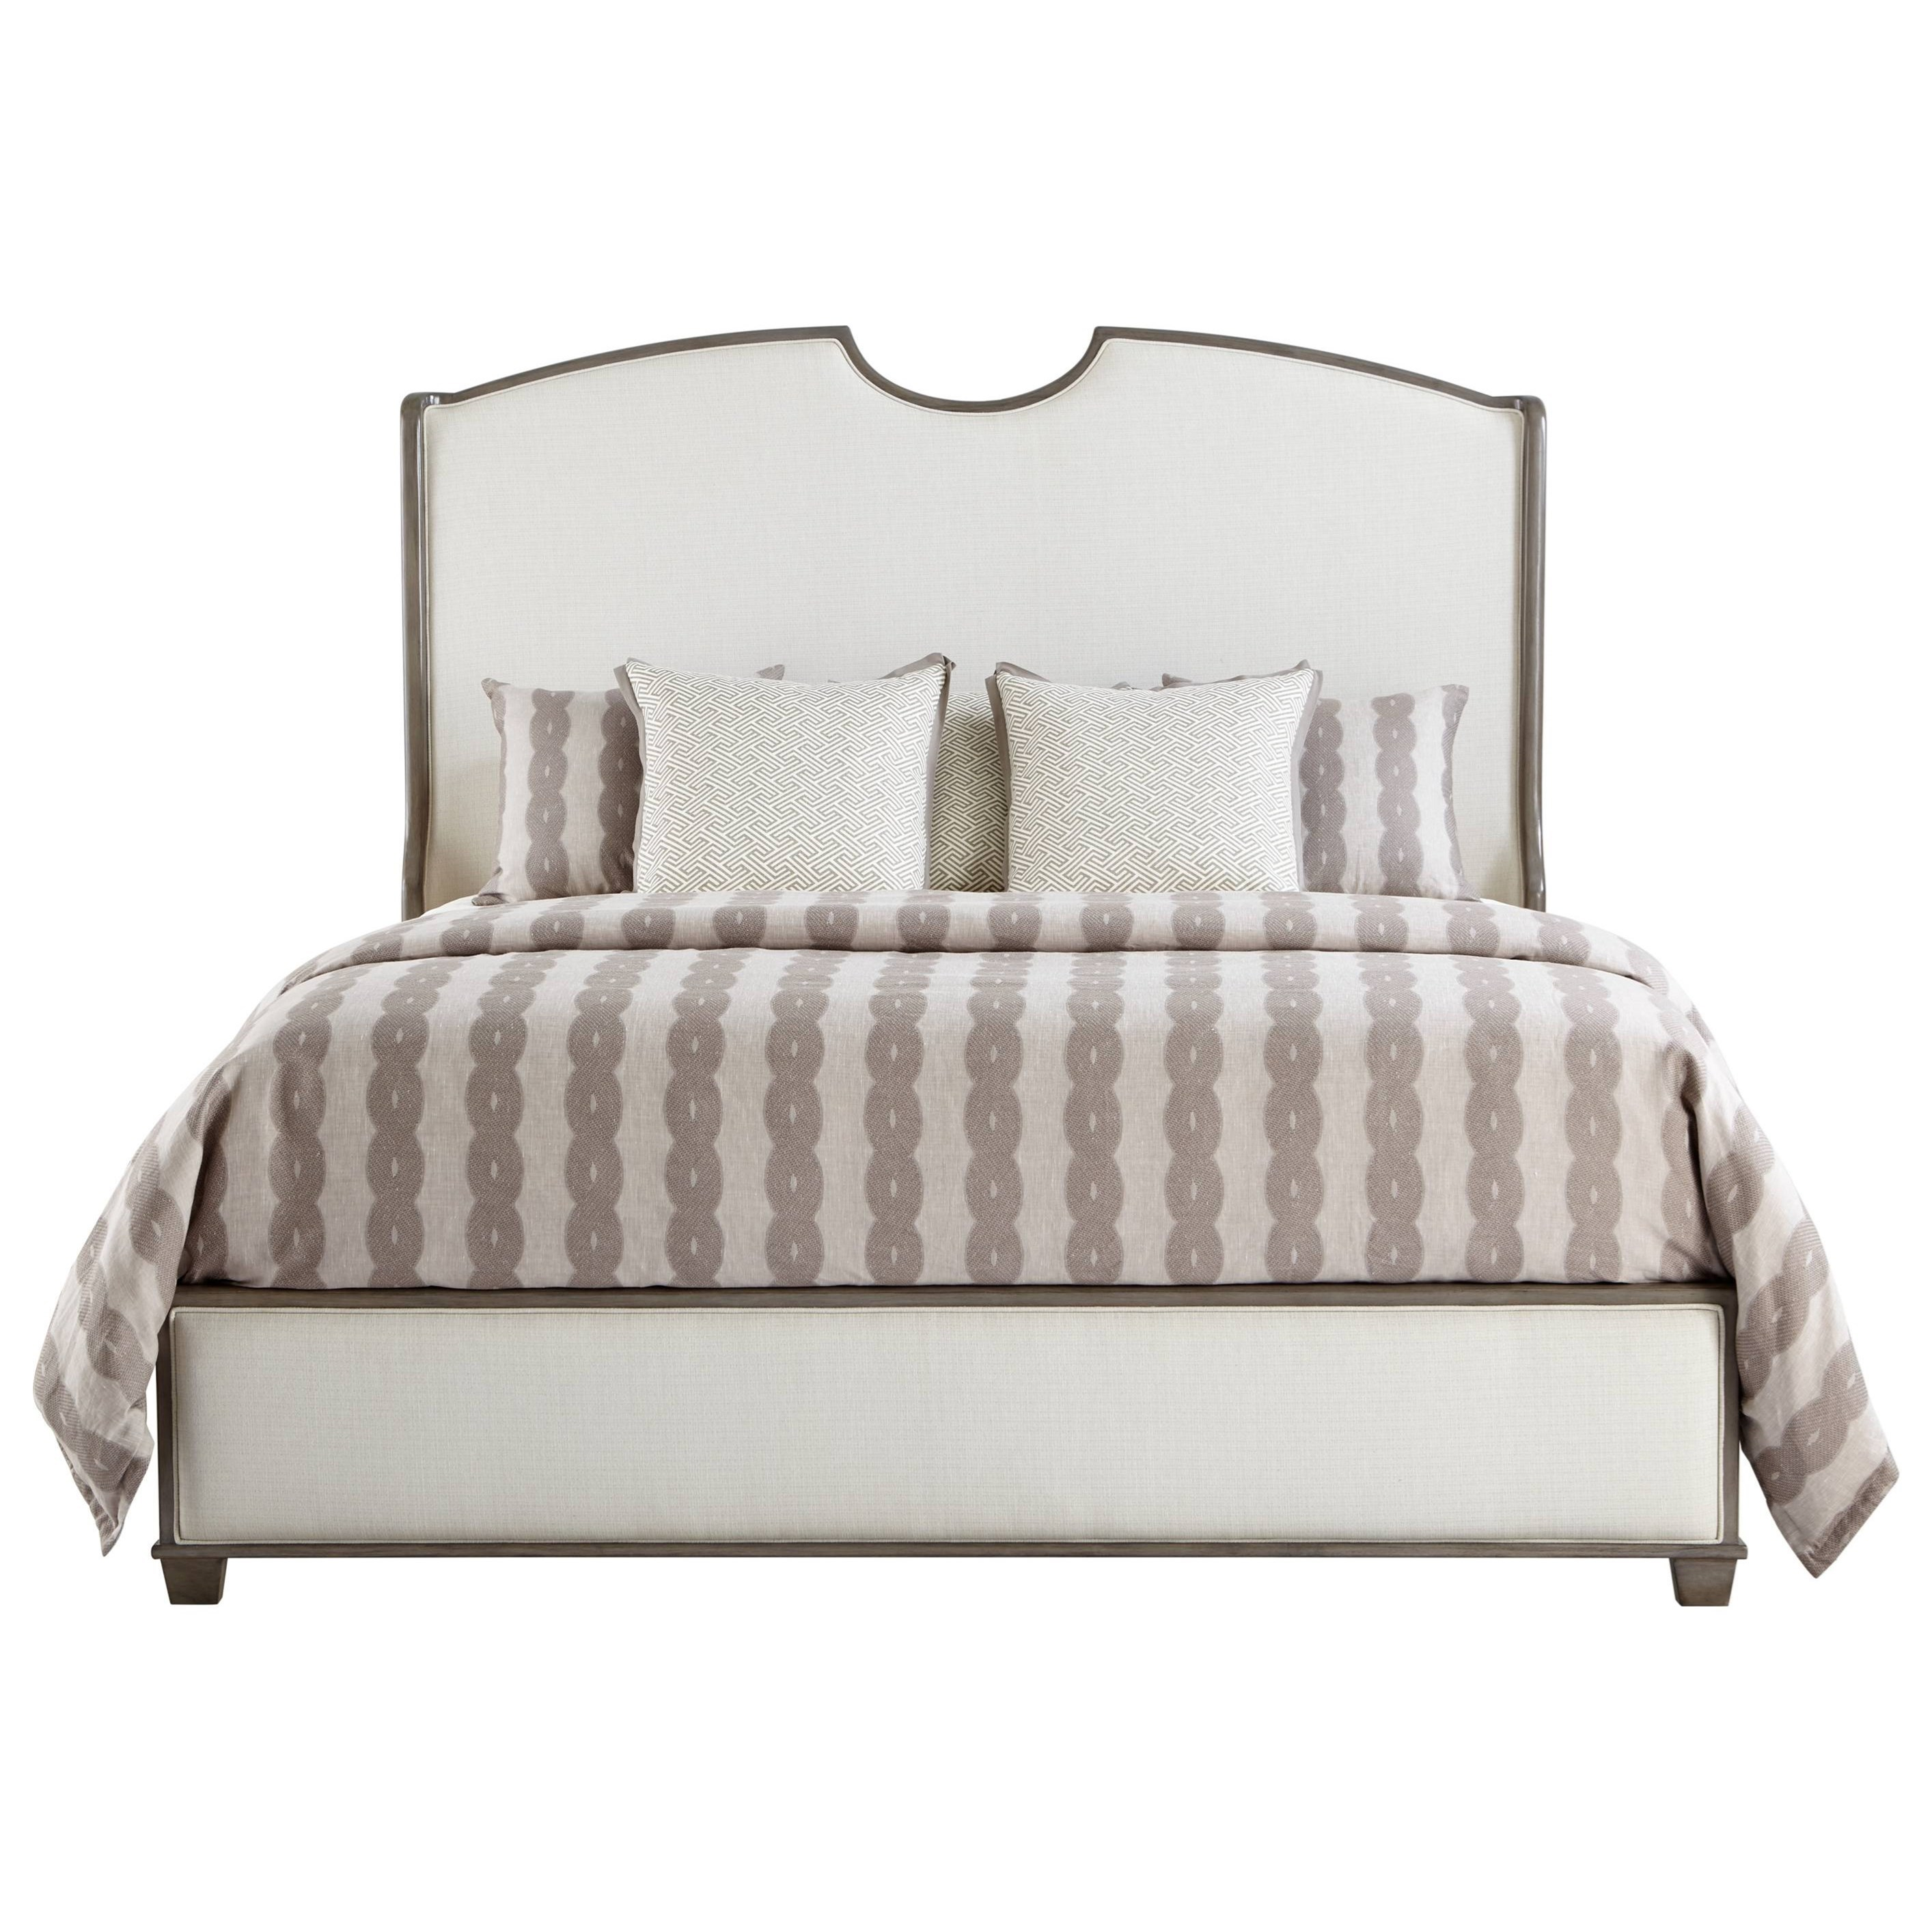 Stanley Furniture Coastal Living Oasis California King Solstice Canyon Shelter Bed - Item Number: 527-63-48